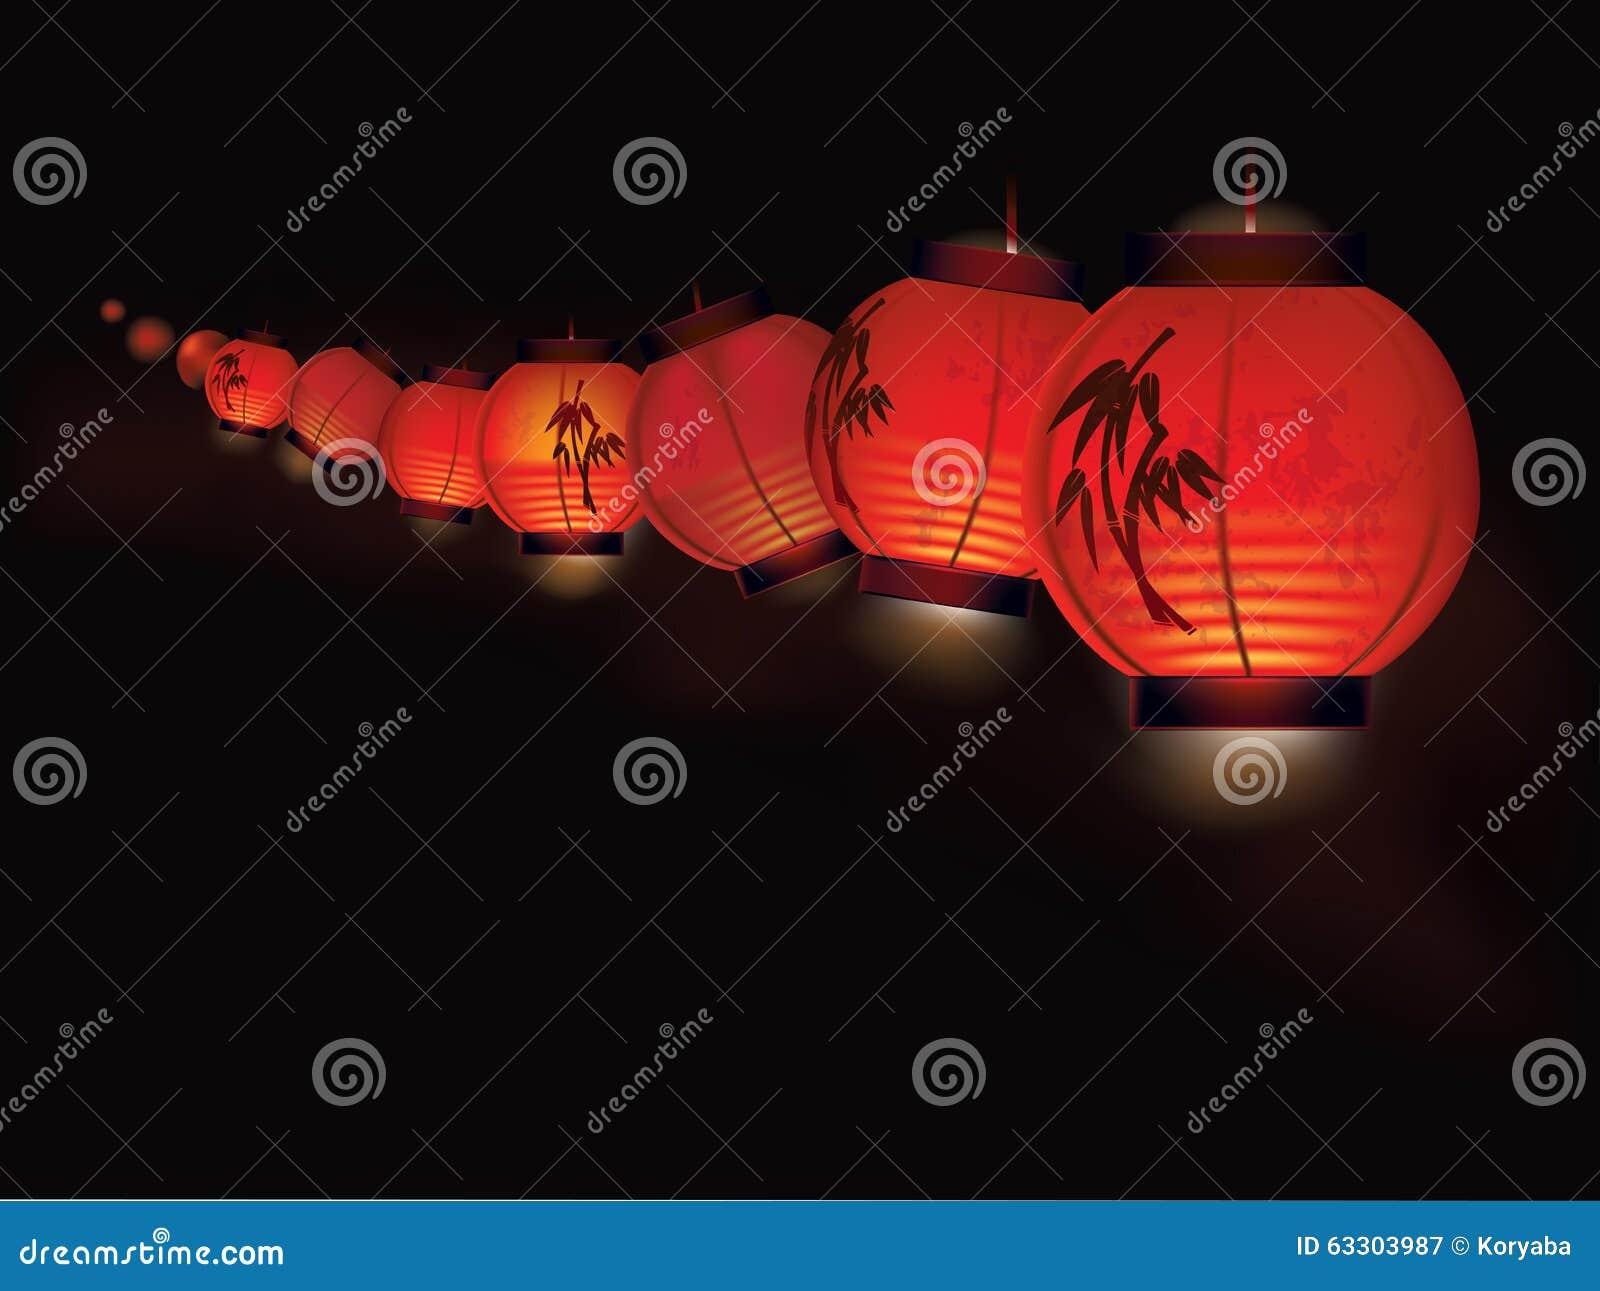 guirlande chinoise de lampion illustration de vecteur image 63303987. Black Bedroom Furniture Sets. Home Design Ideas